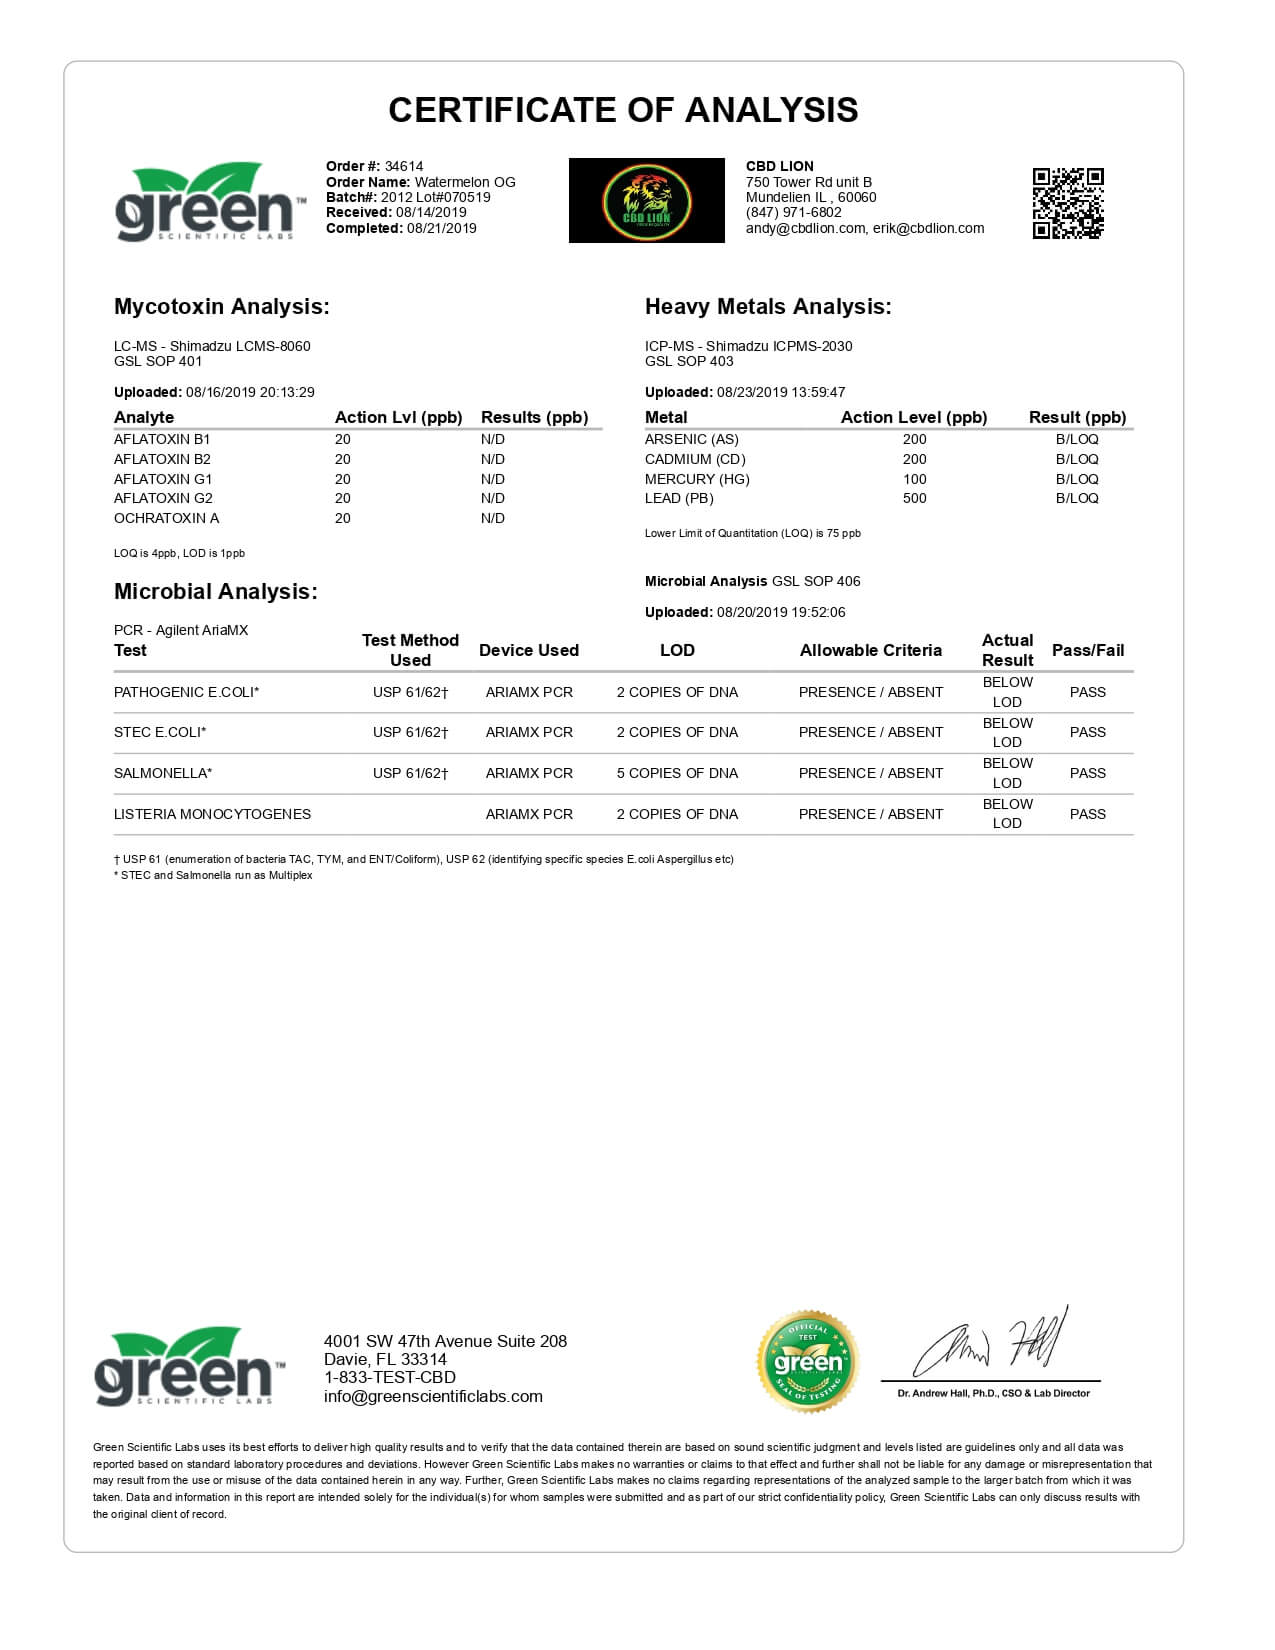 CBD Lion CBD Concentrate Watermelon OG Shatter 0.5g Lab Report